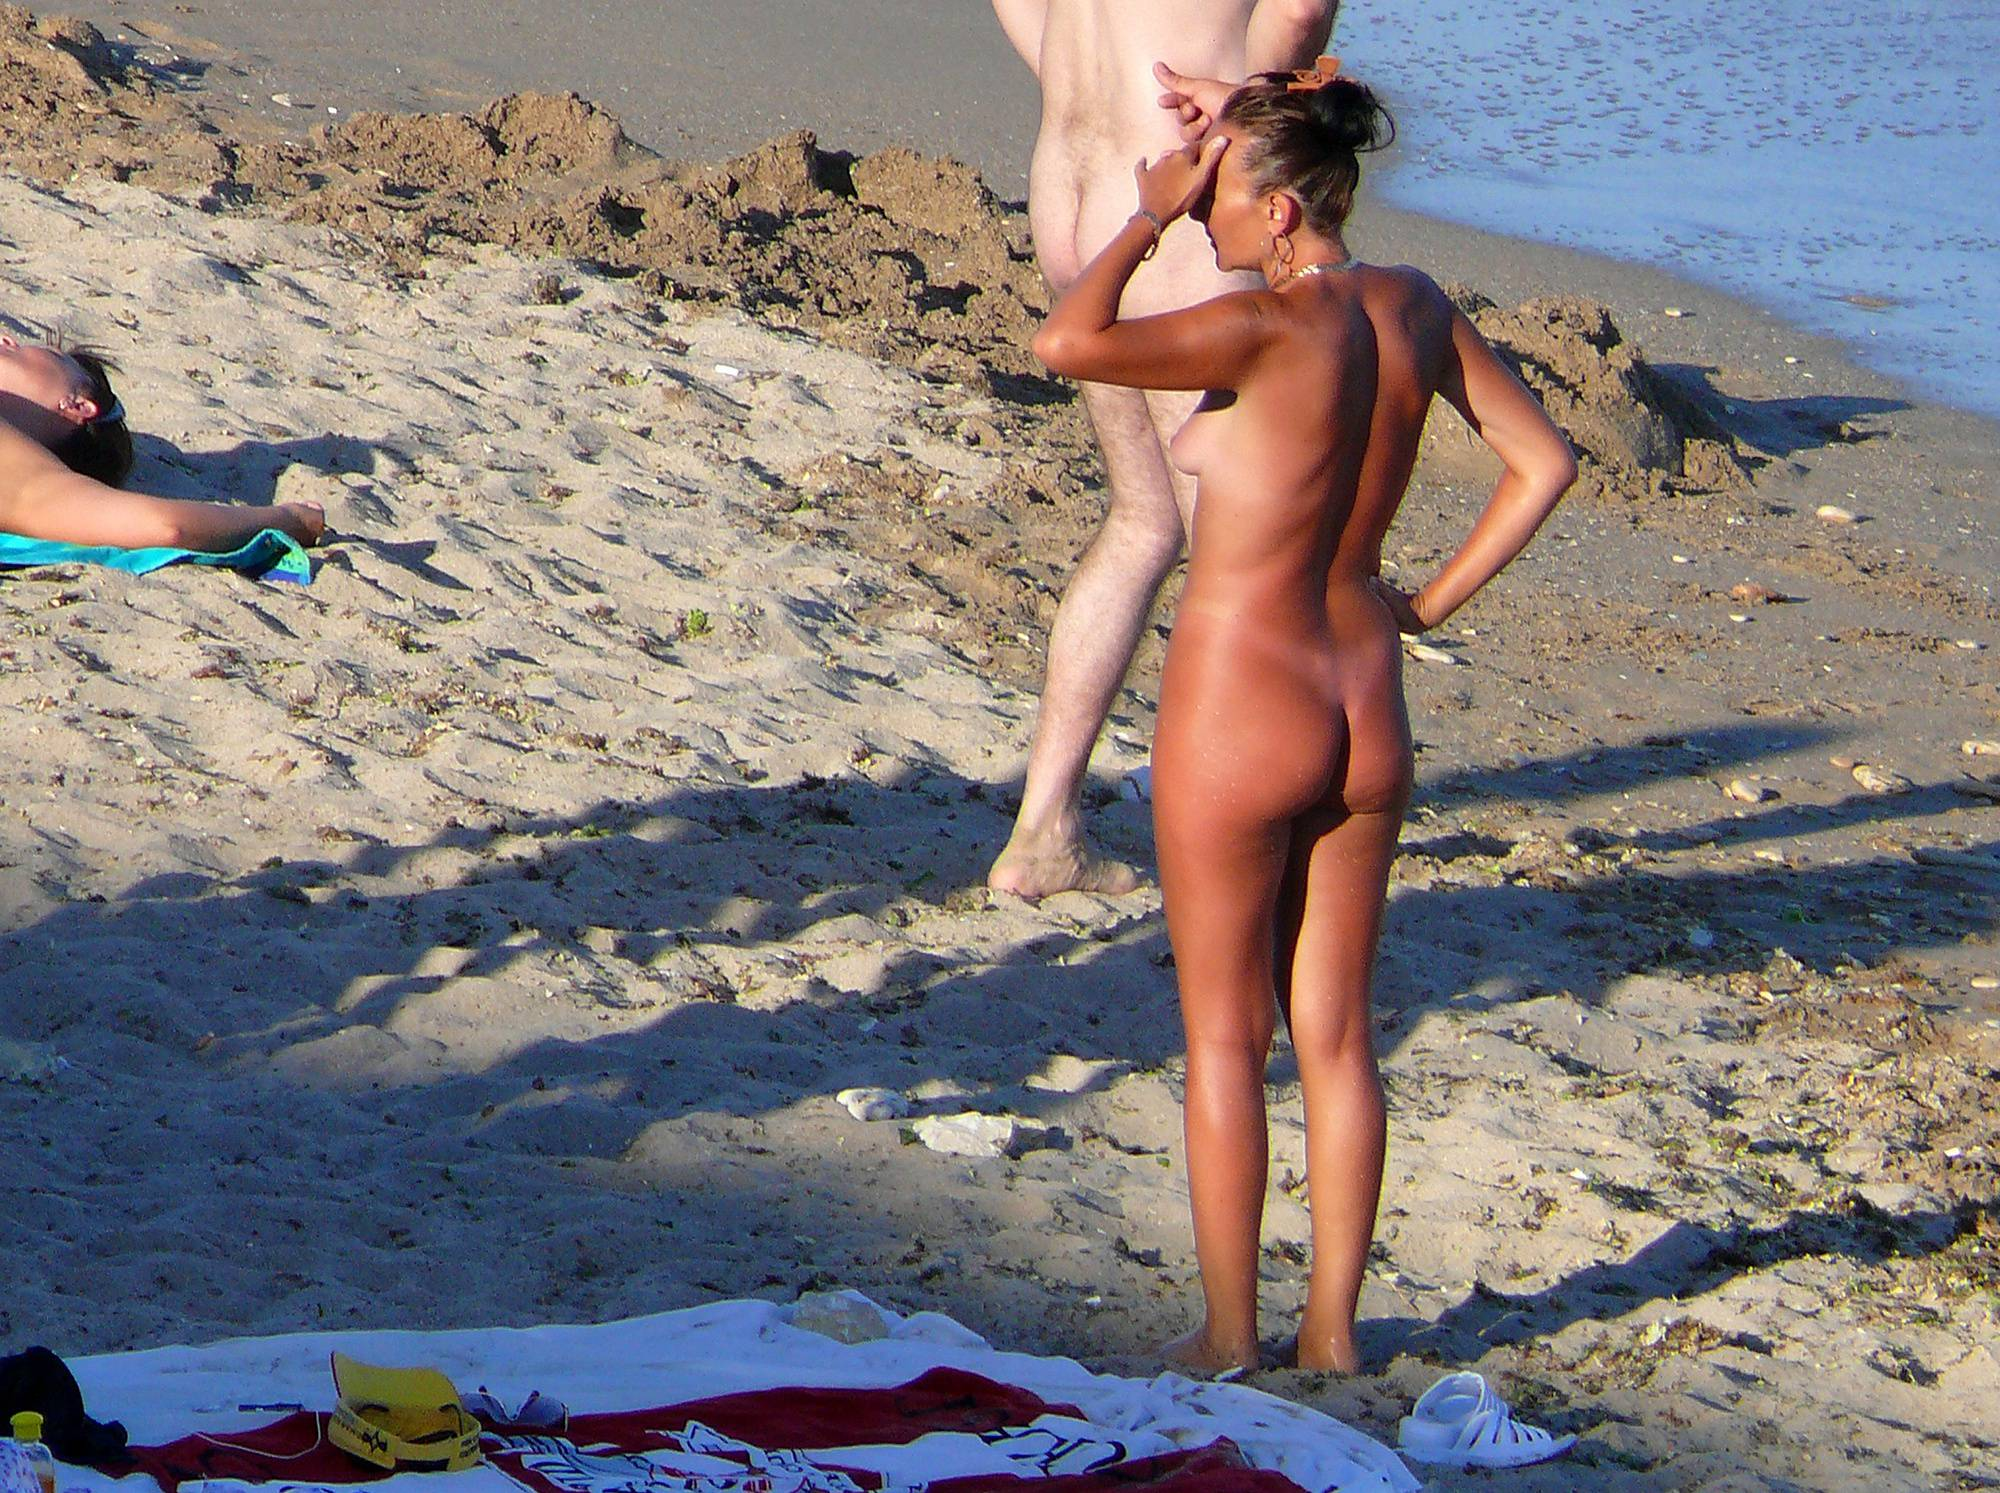 Nudist Pictures Romanian Shoreline Sands - 1